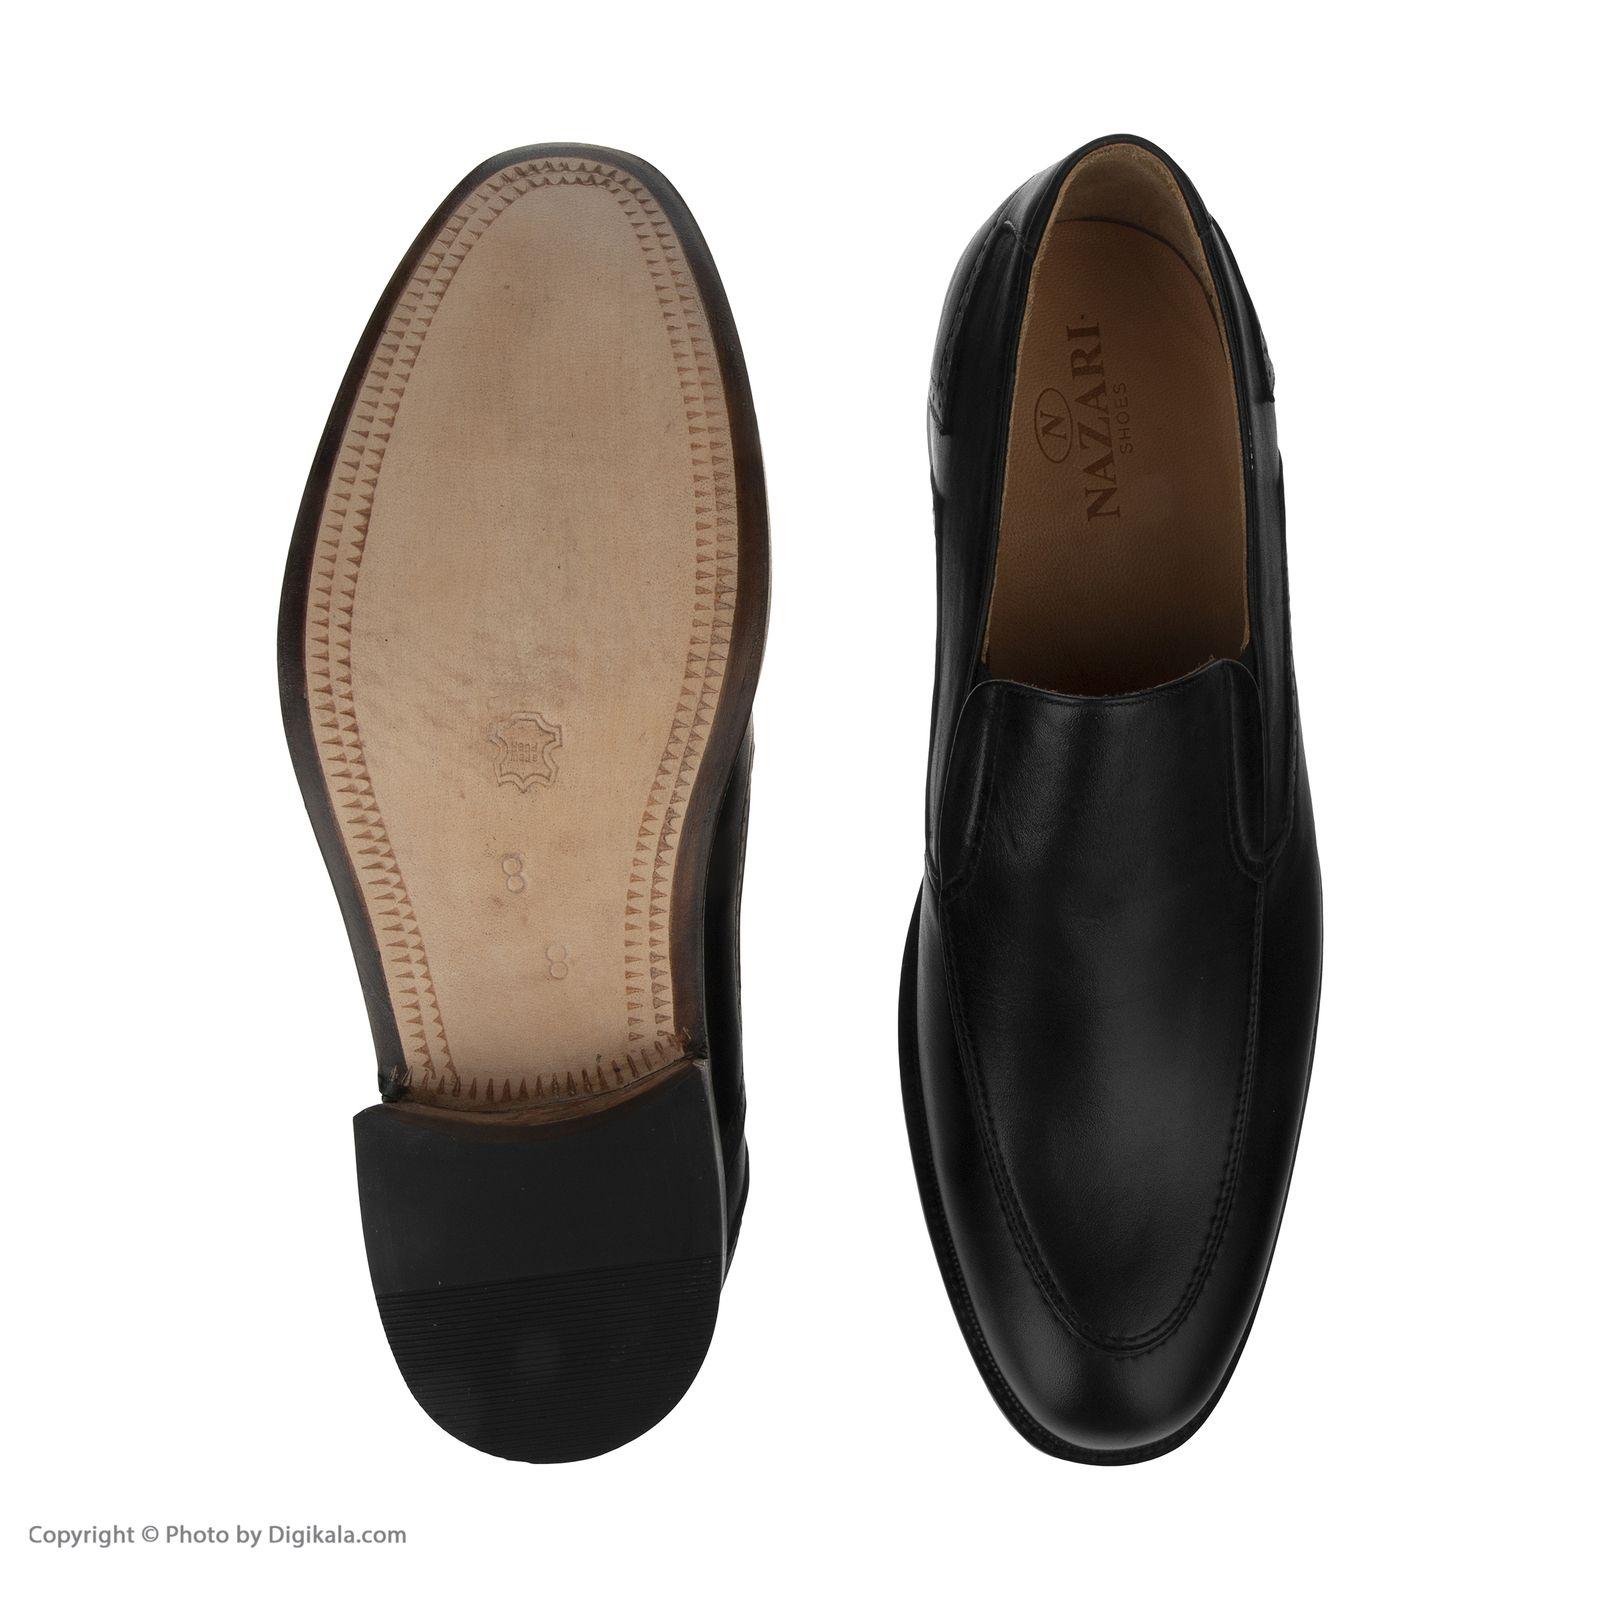 کفش مردانه نظری کد 426 -  - 3